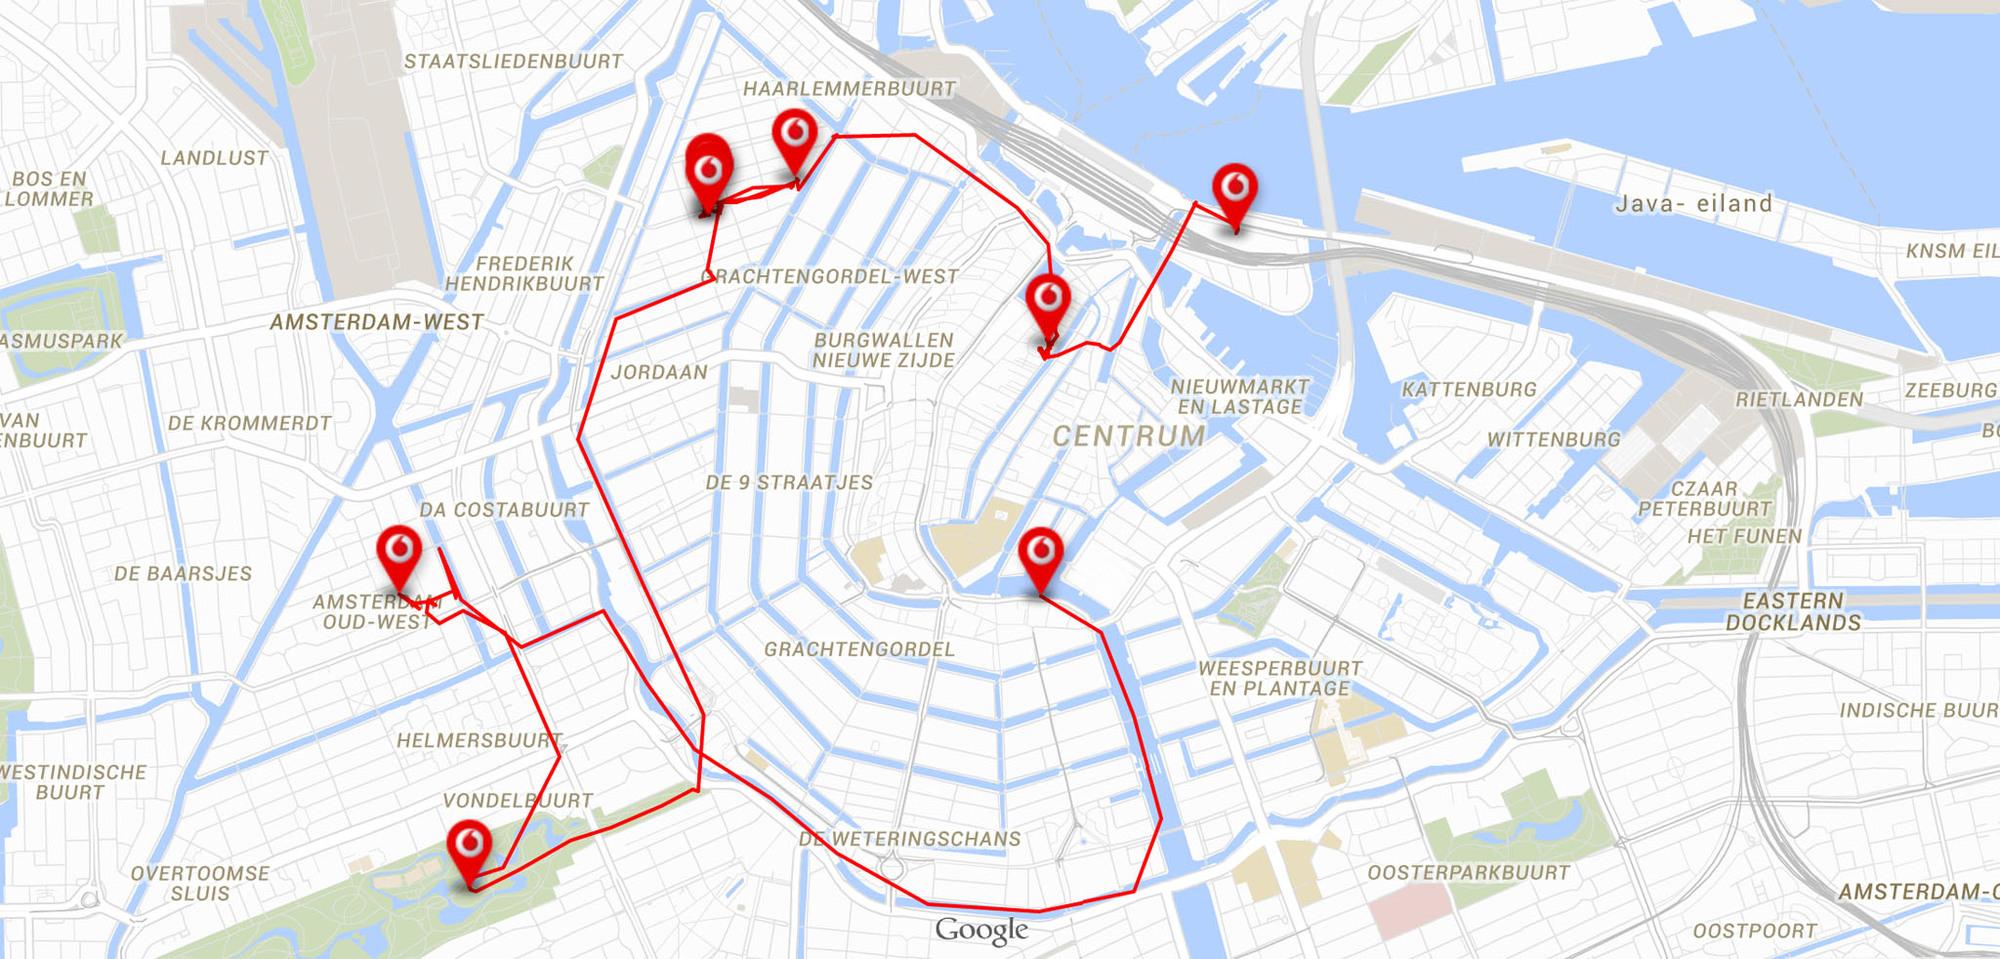 citinerary-izddw-map.jpg